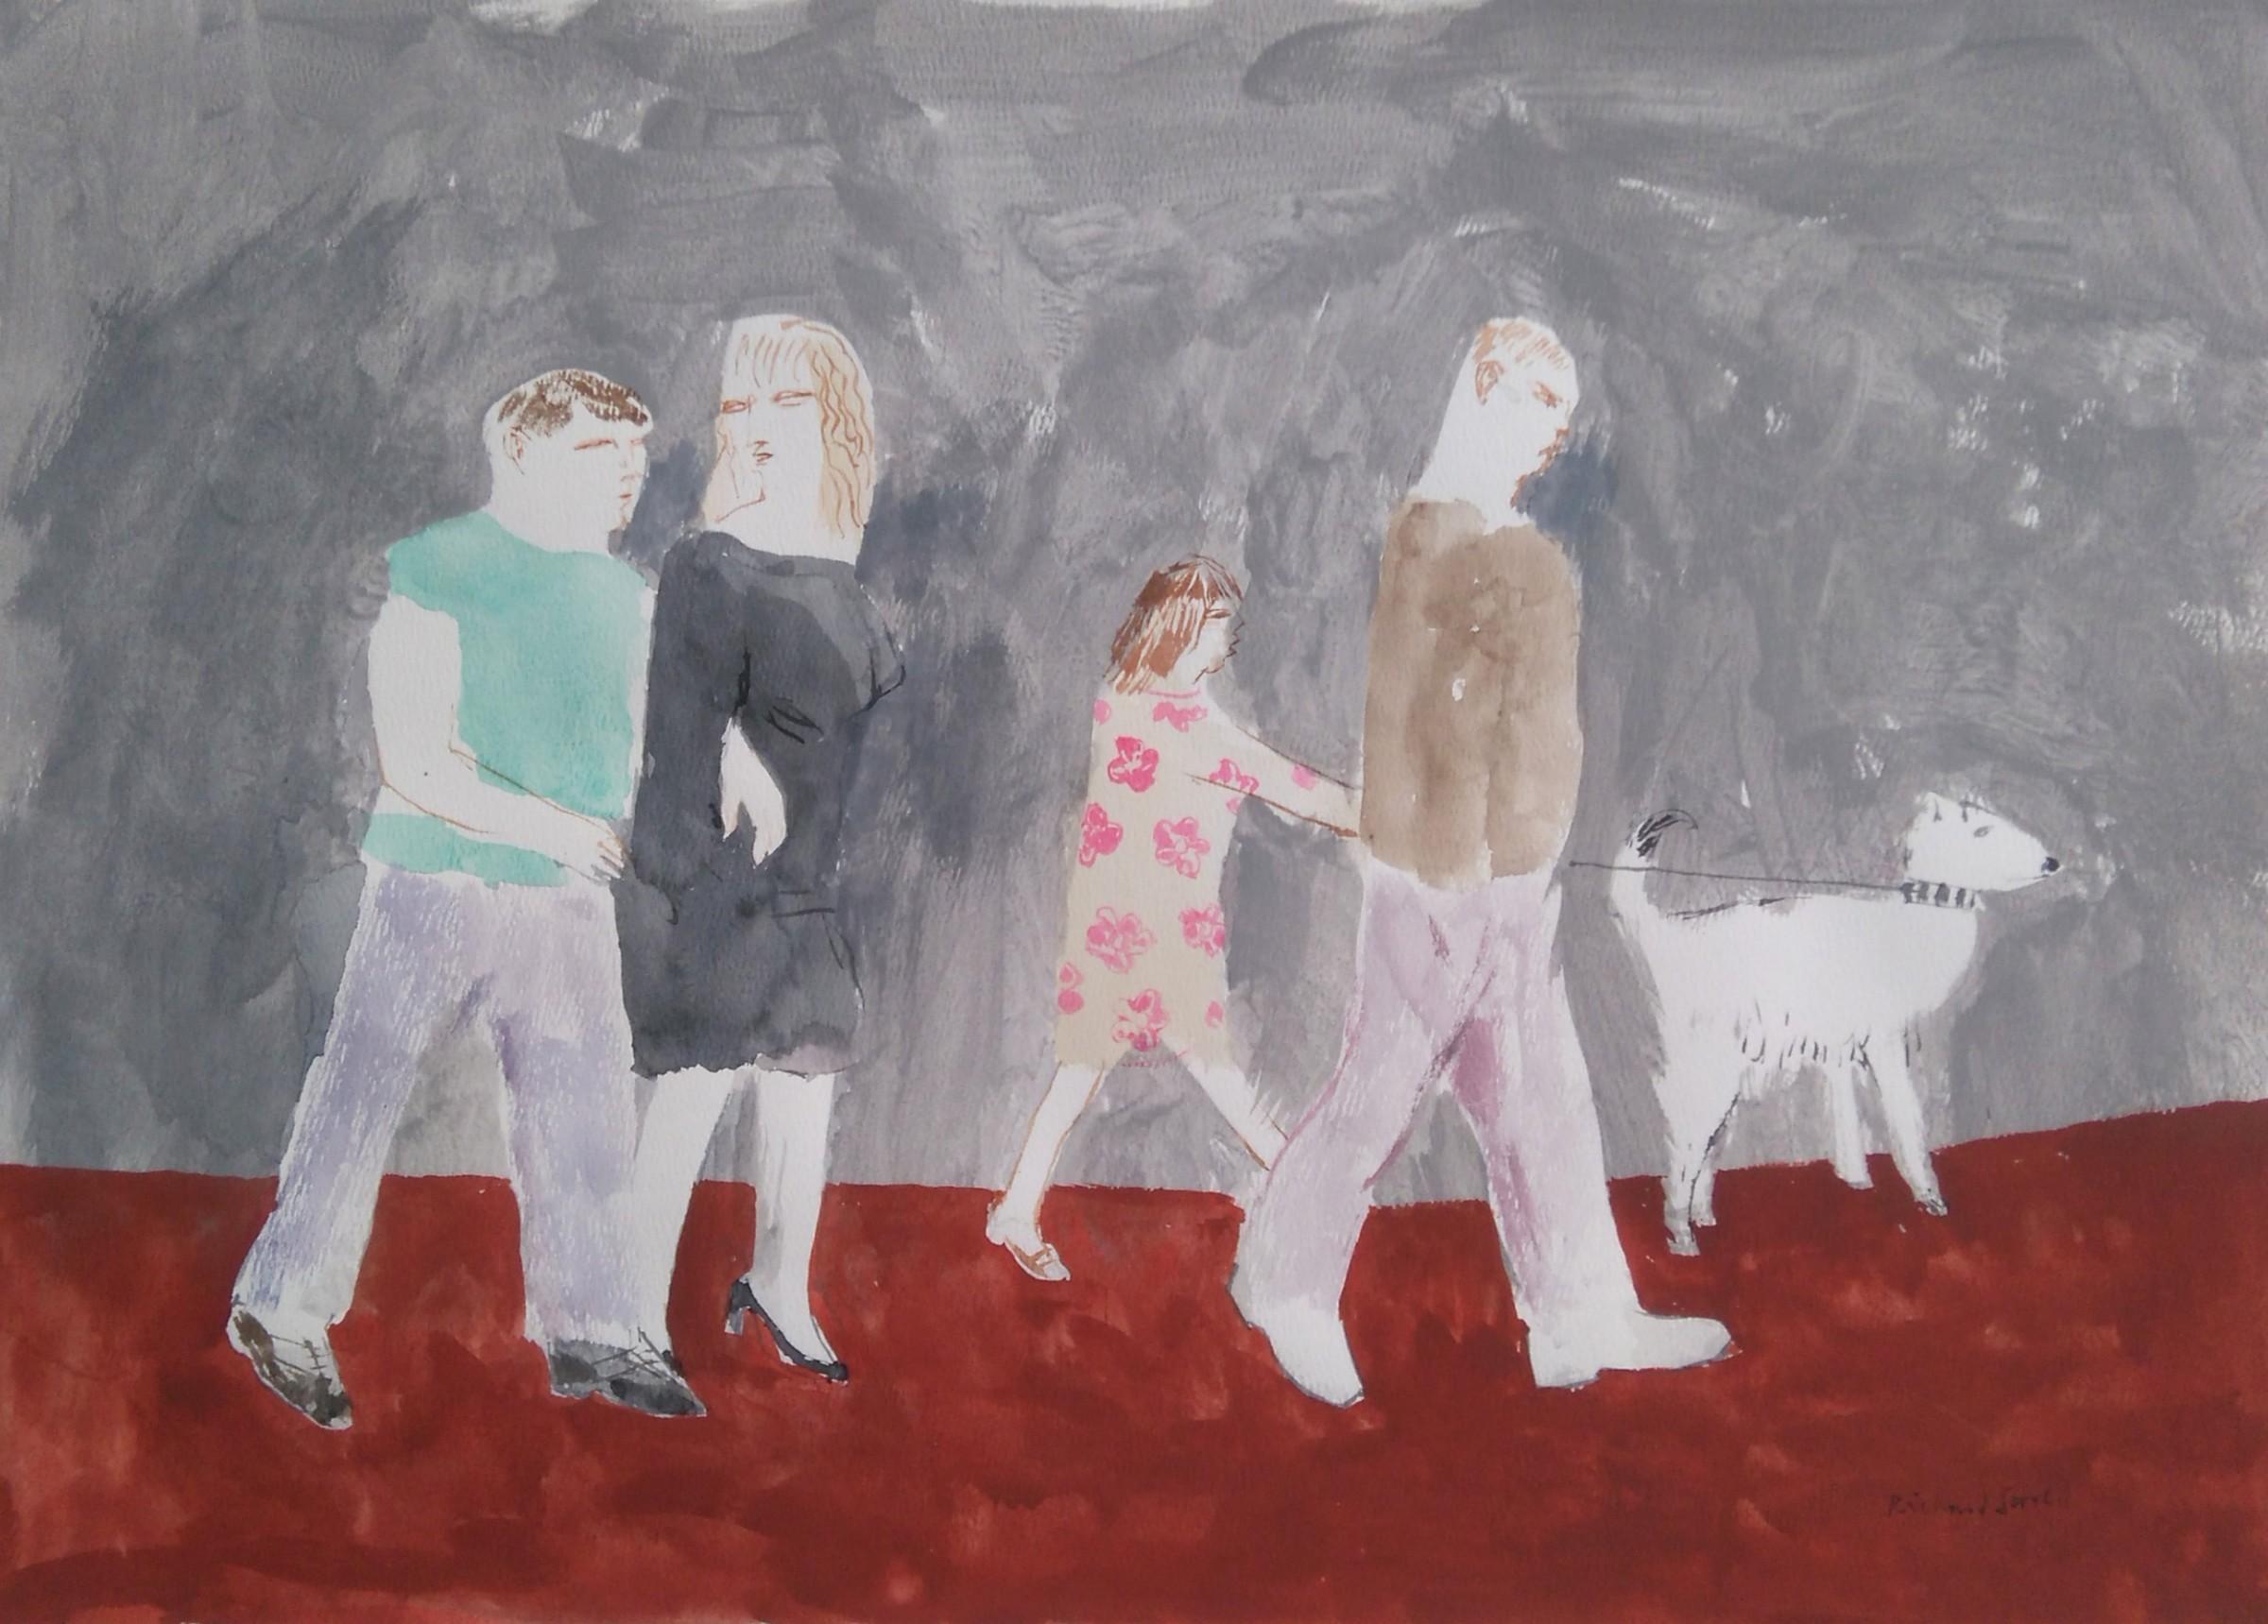 <span class=&#34;link fancybox-details-link&#34;><a href=&#34;/exhibitions/24/works/artworks_standalone10805/&#34;>View Detail Page</a></span><div class=&#34;artist&#34;><span class=&#34;artist&#34;><strong>Richard Sorrell</strong></span></div><div class=&#34;title&#34;><em>Walking in St Just</em></div><div class=&#34;medium&#34;>acrylic</div>